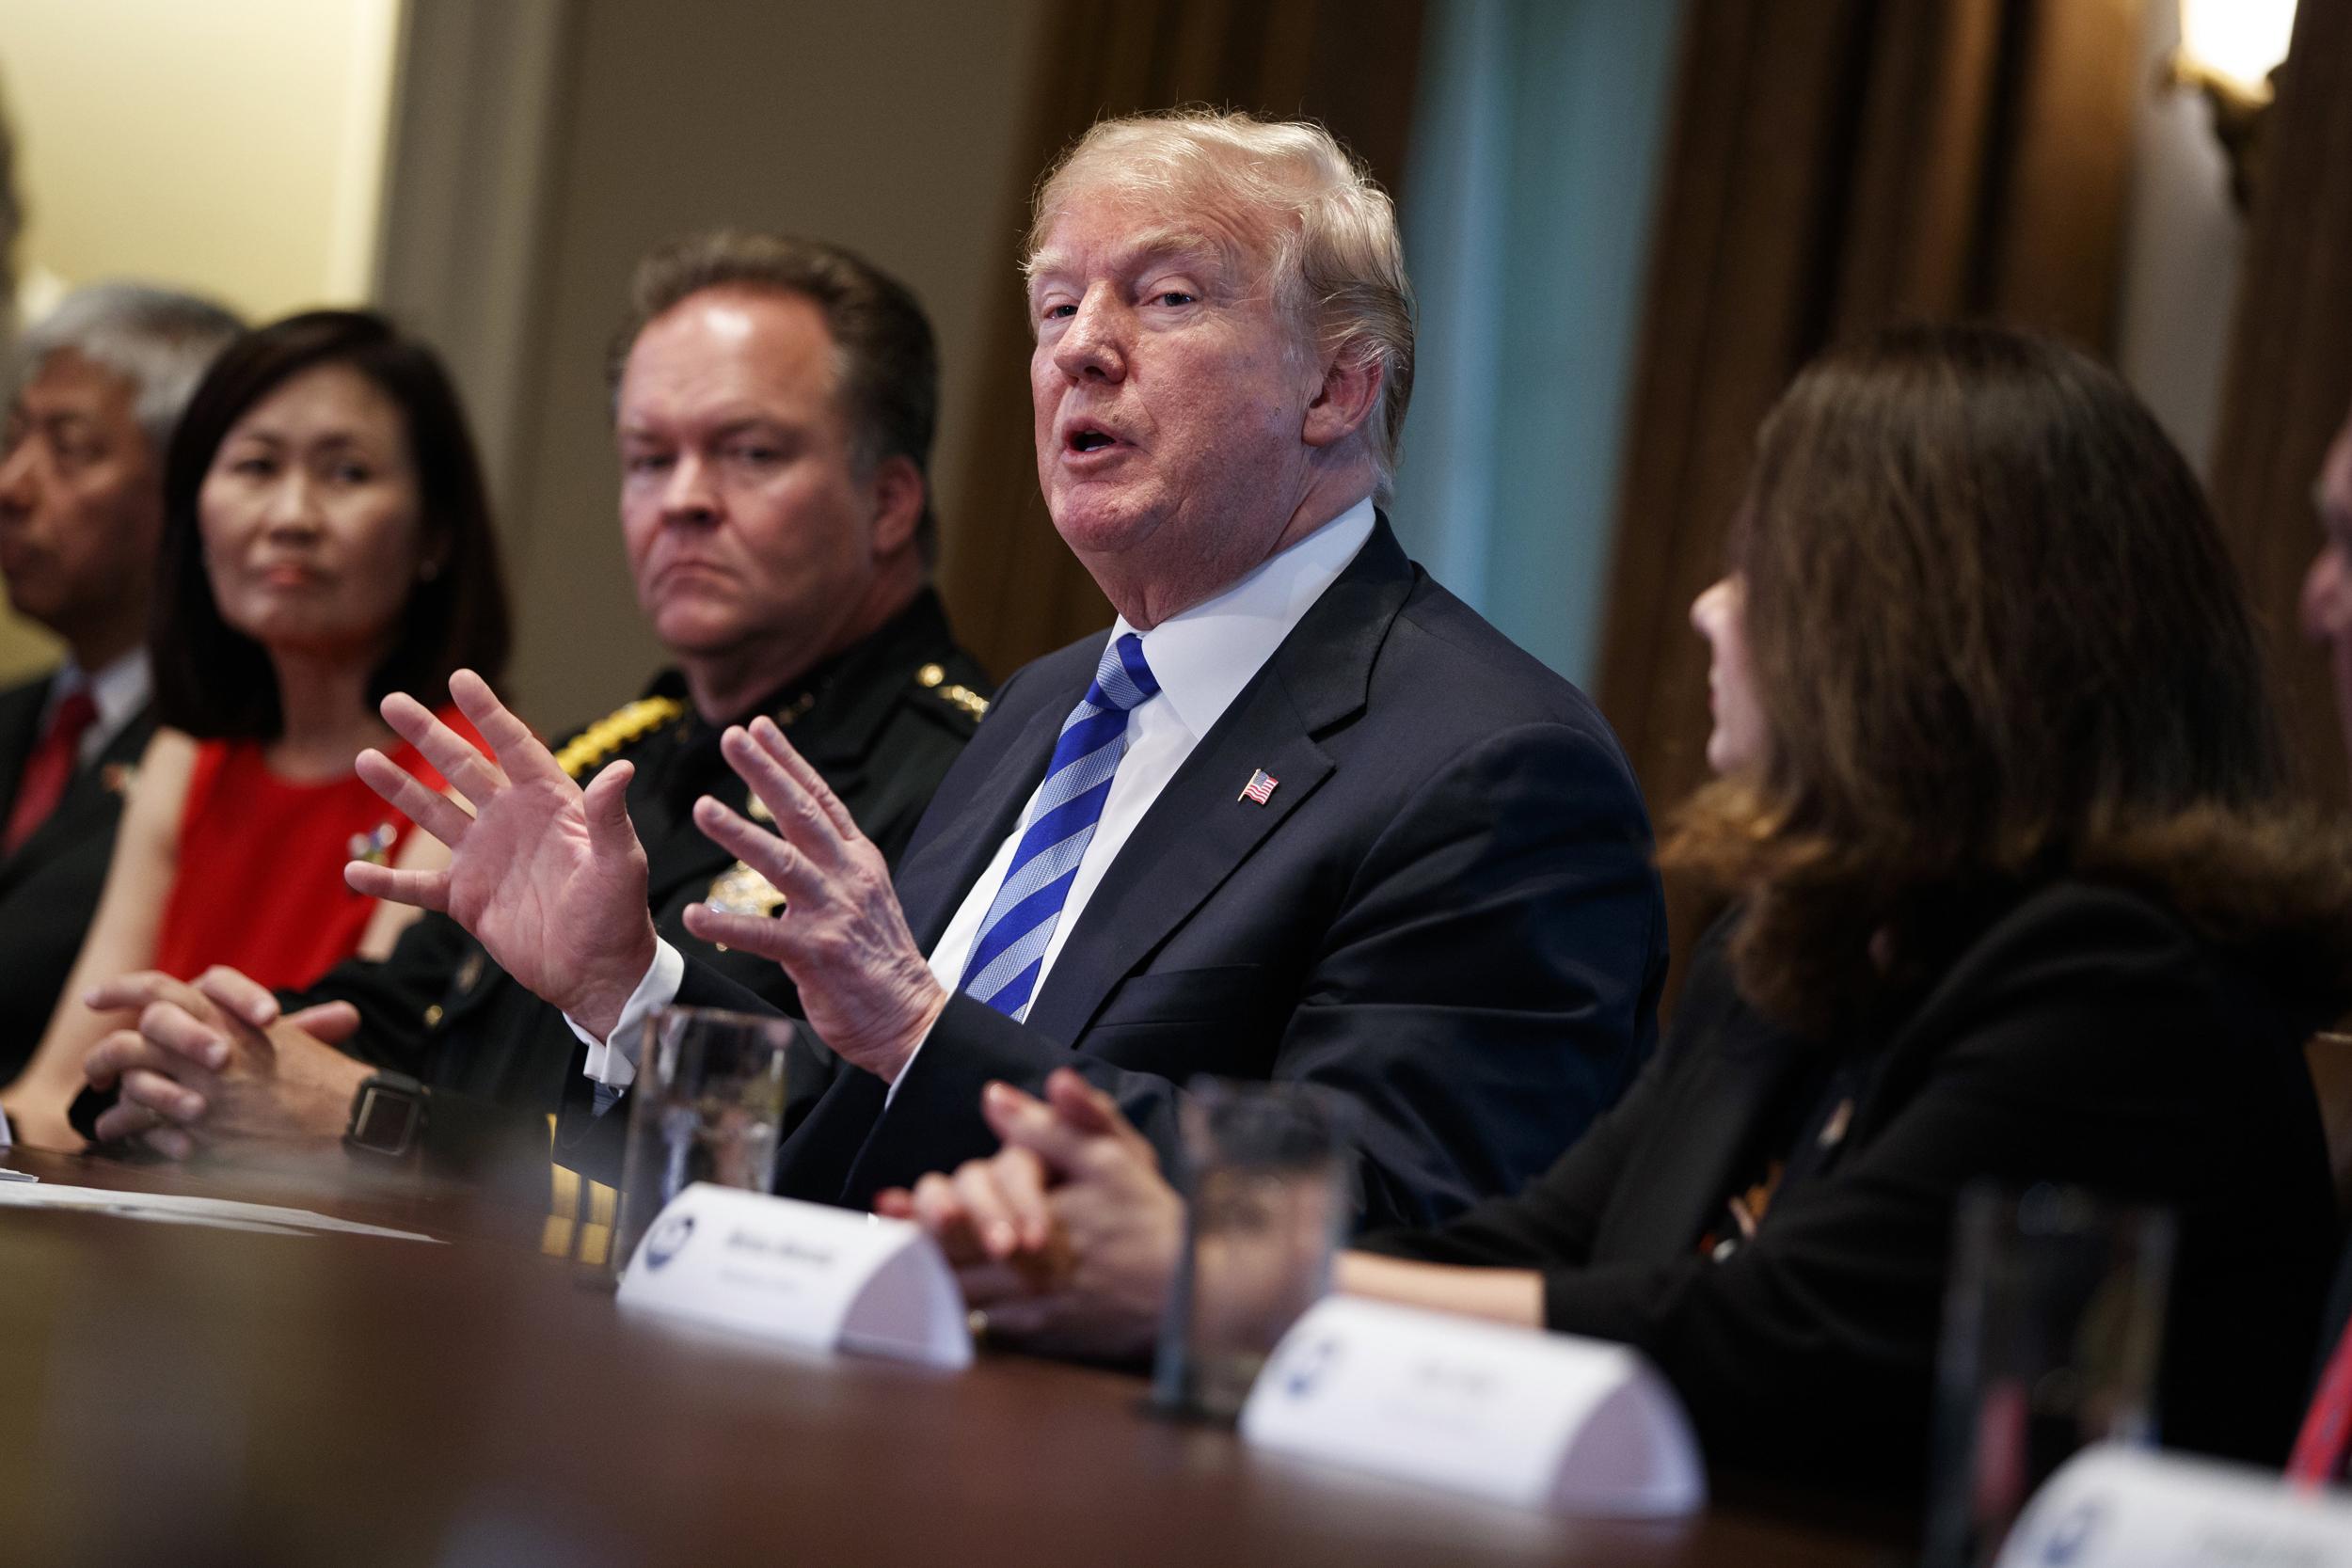 Trump-draws-rebuke-for-'animal'-remark-at-immigration-talk